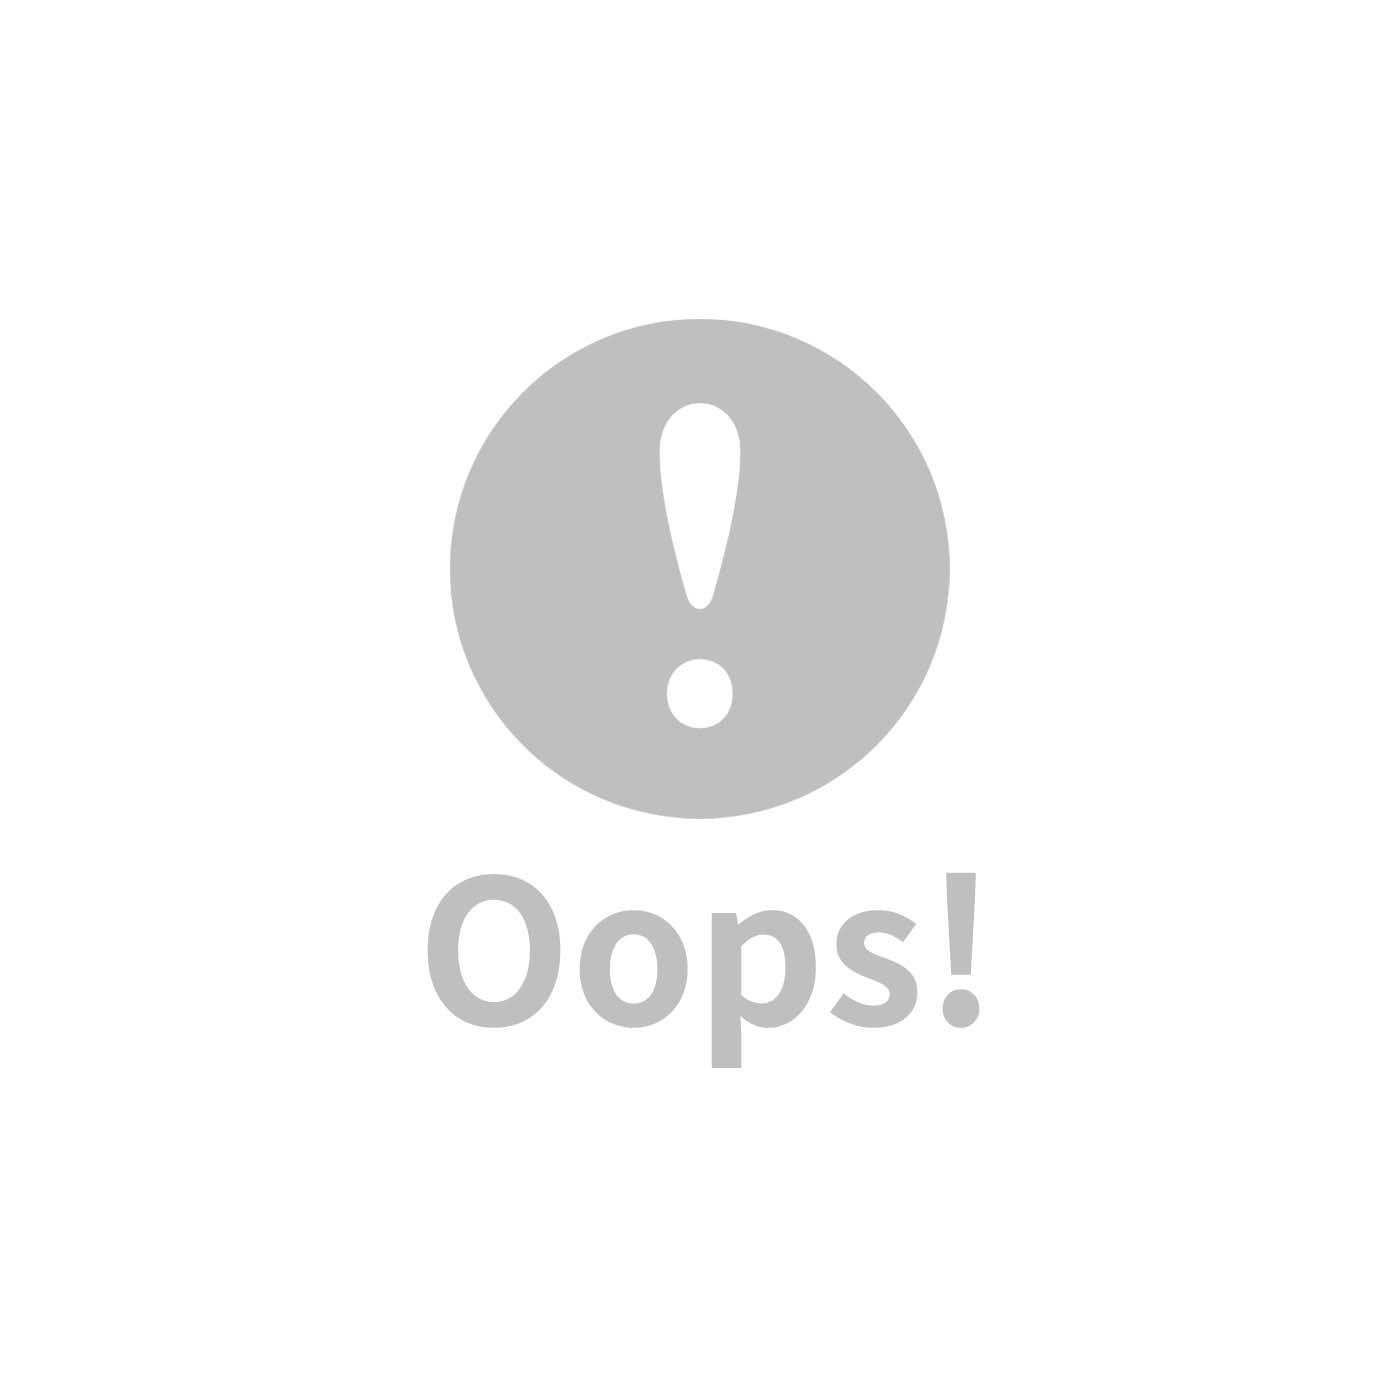 global affairs 童話手工編織安撫搖鈴_飛機系列(2入組)